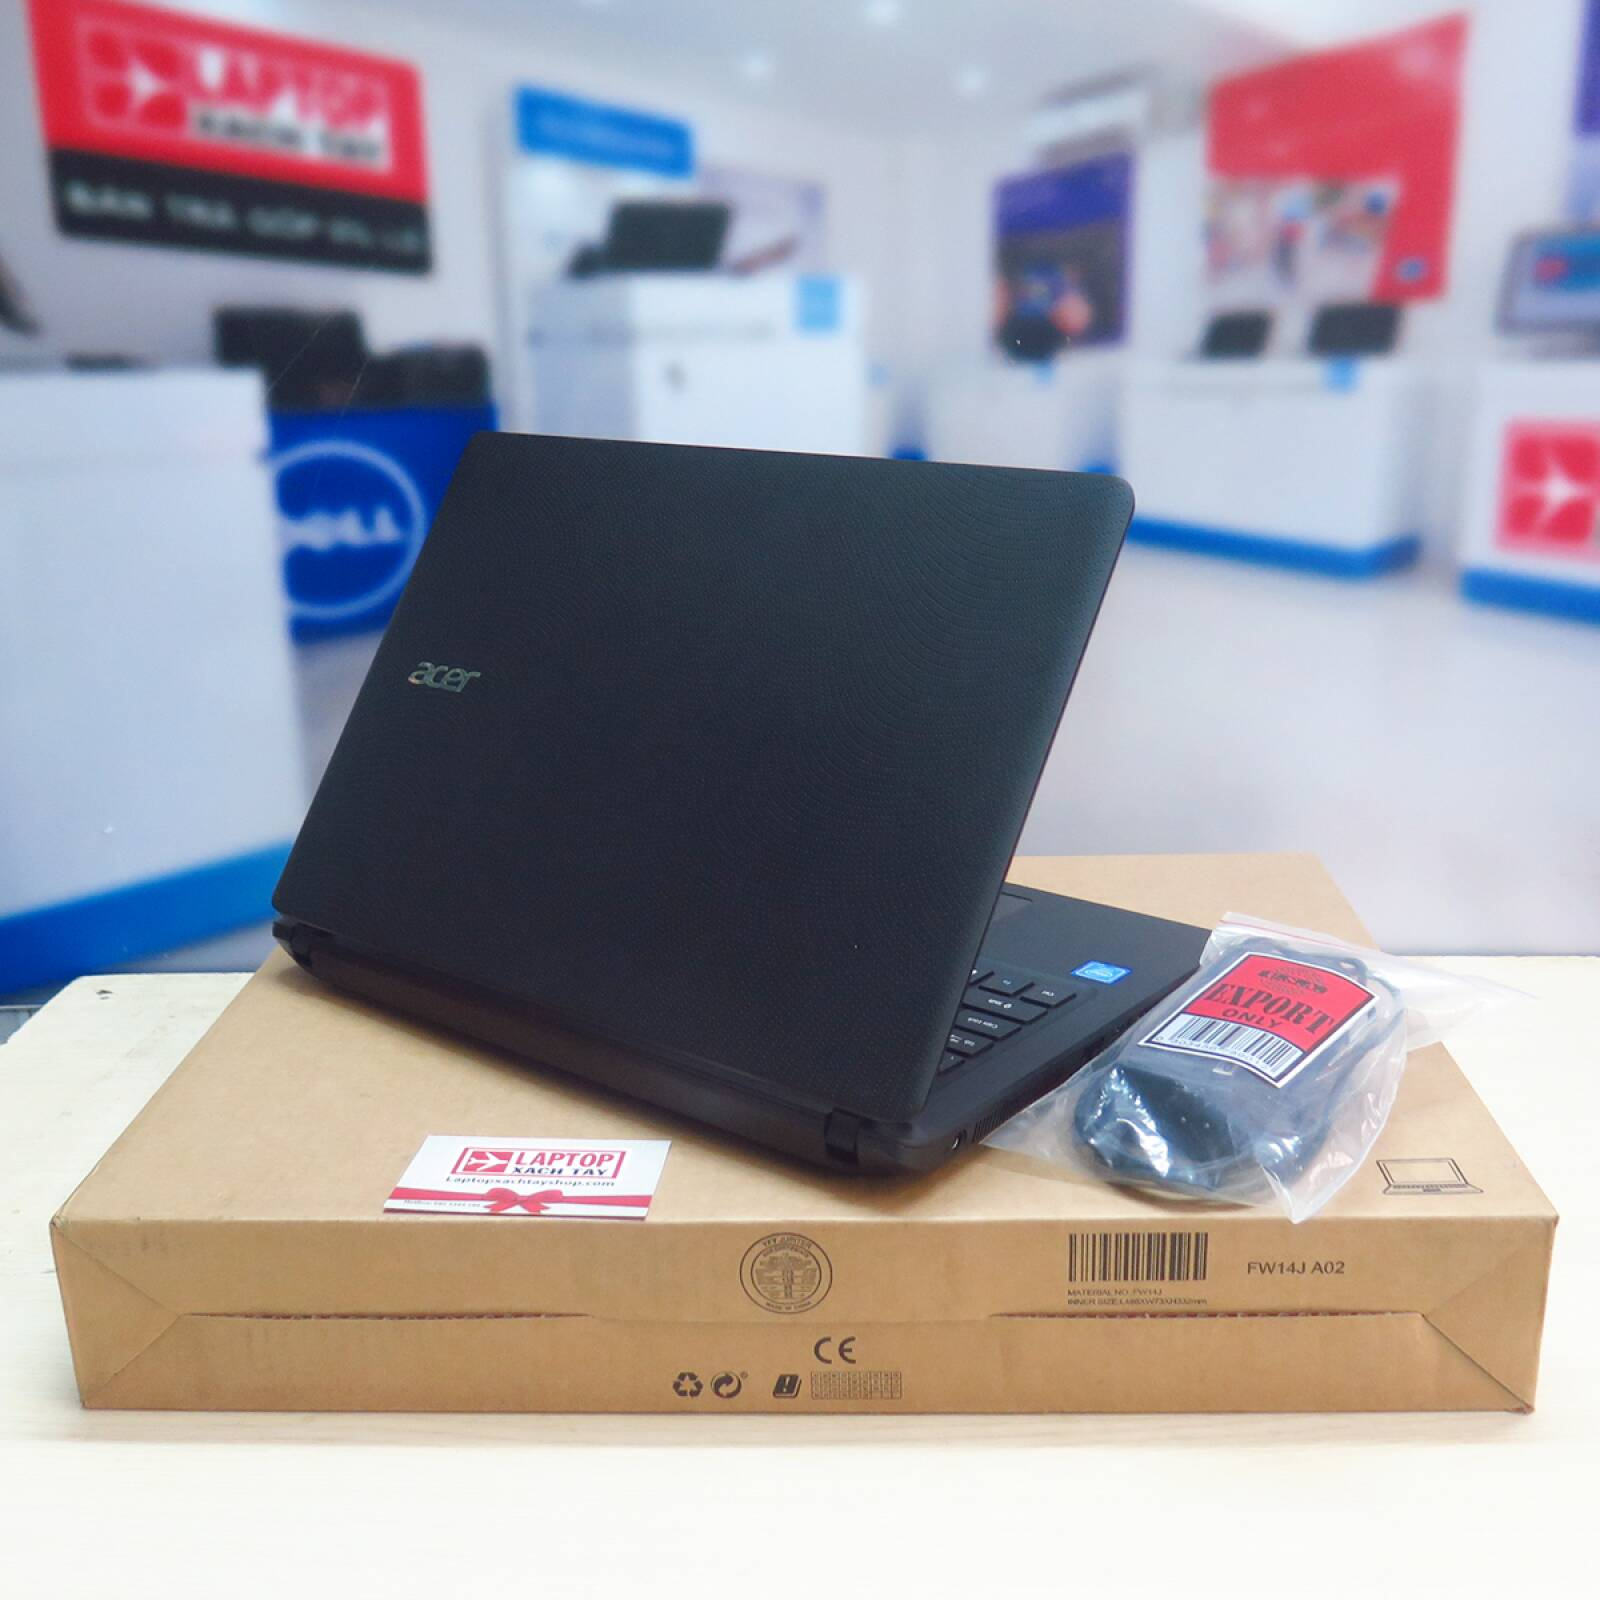 Acer ES1 432